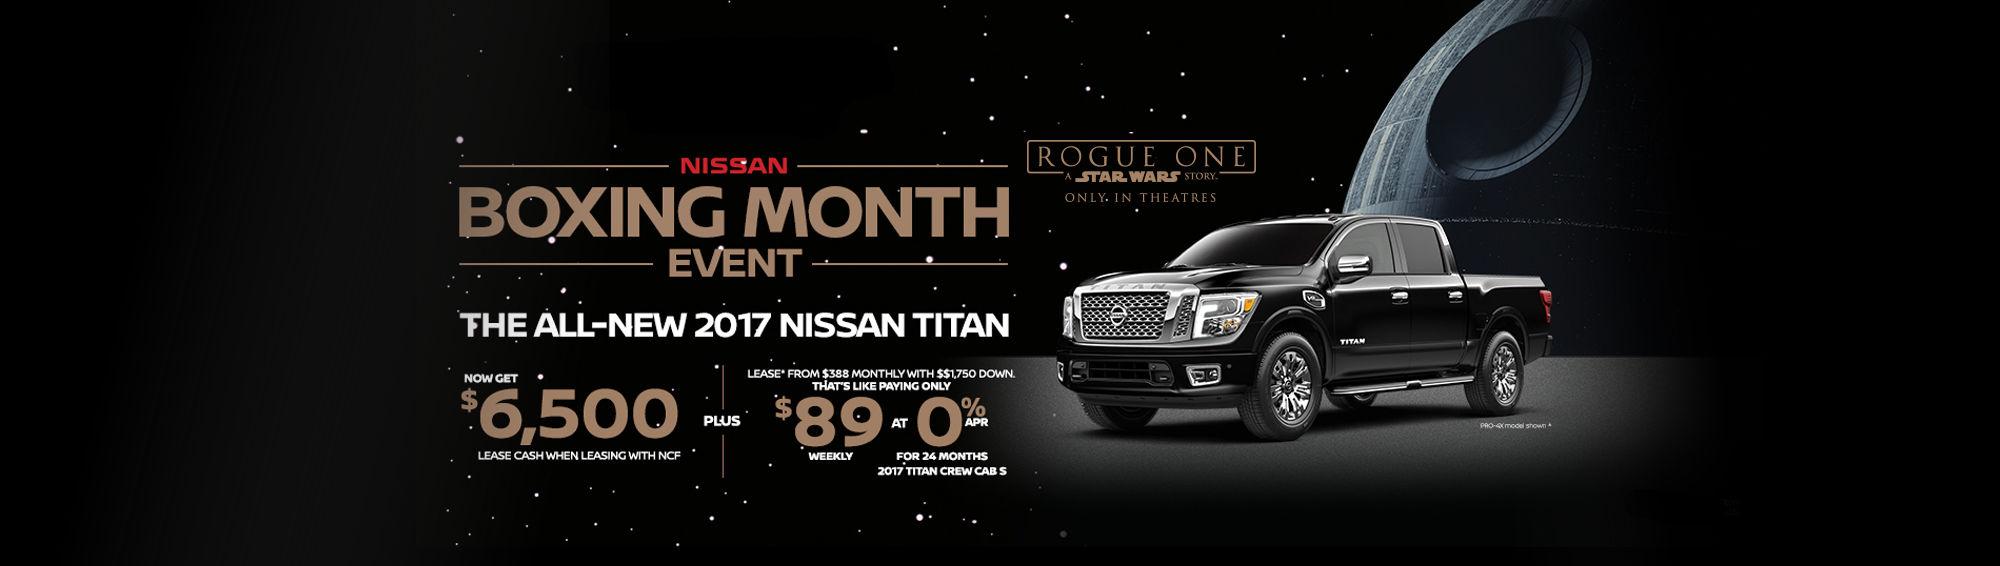 Nissan's Boxing Month Titan (Desktop) (Copy)